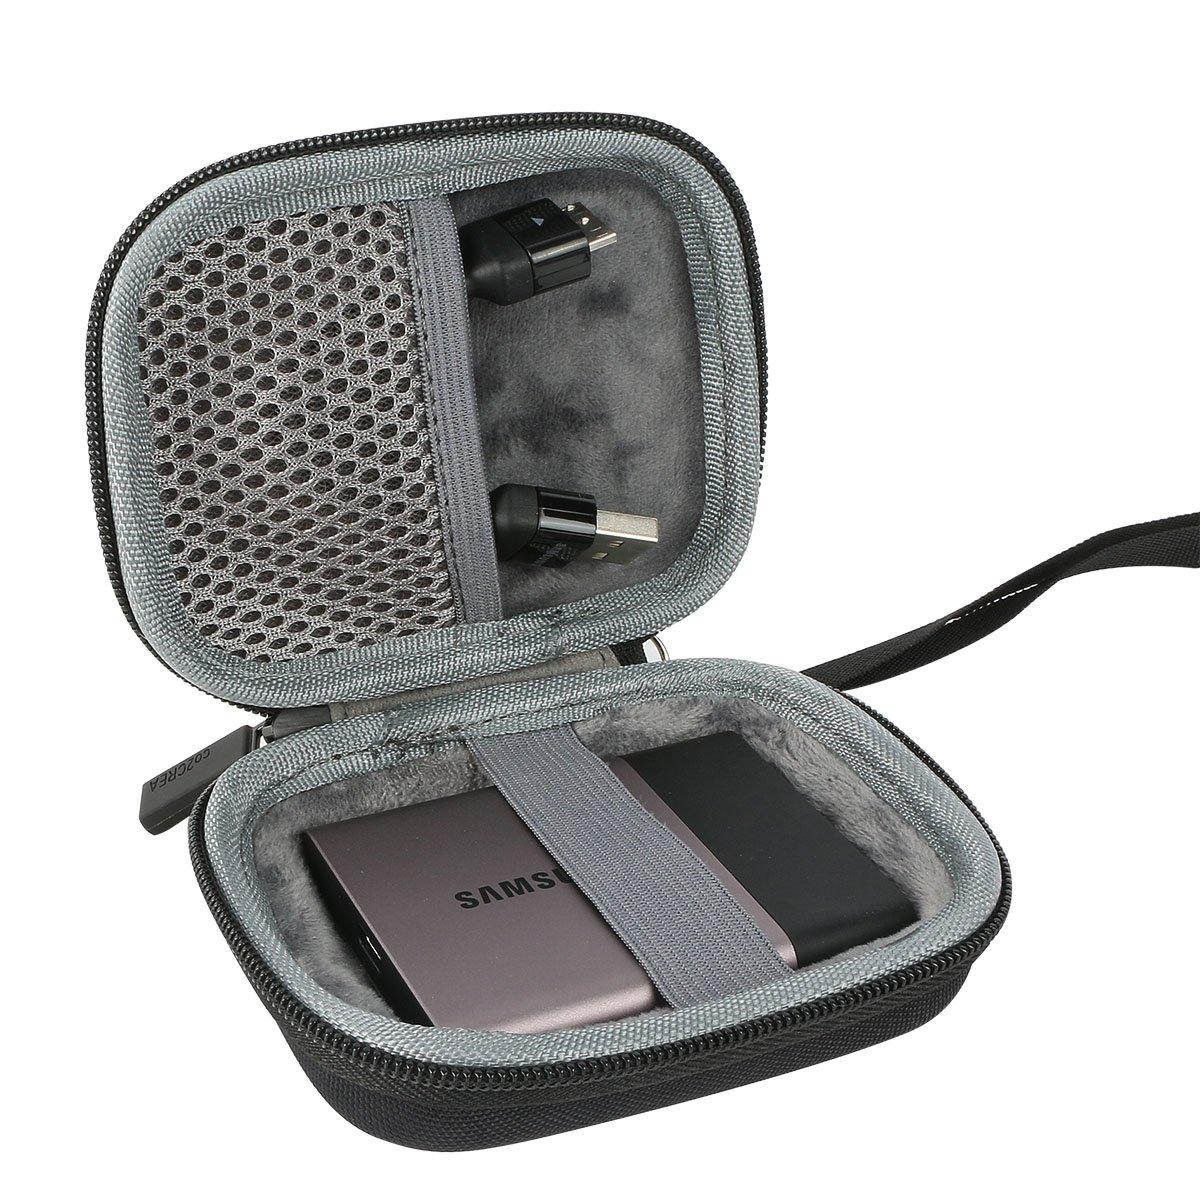 Hard Drive Bags Cases Wd Wdbbkd0030 3tb Disk Cartridge Travel Case For Samsung T3 T5 Portable 250gb 500gb 1tb 2tb Ssd Usb 30 External